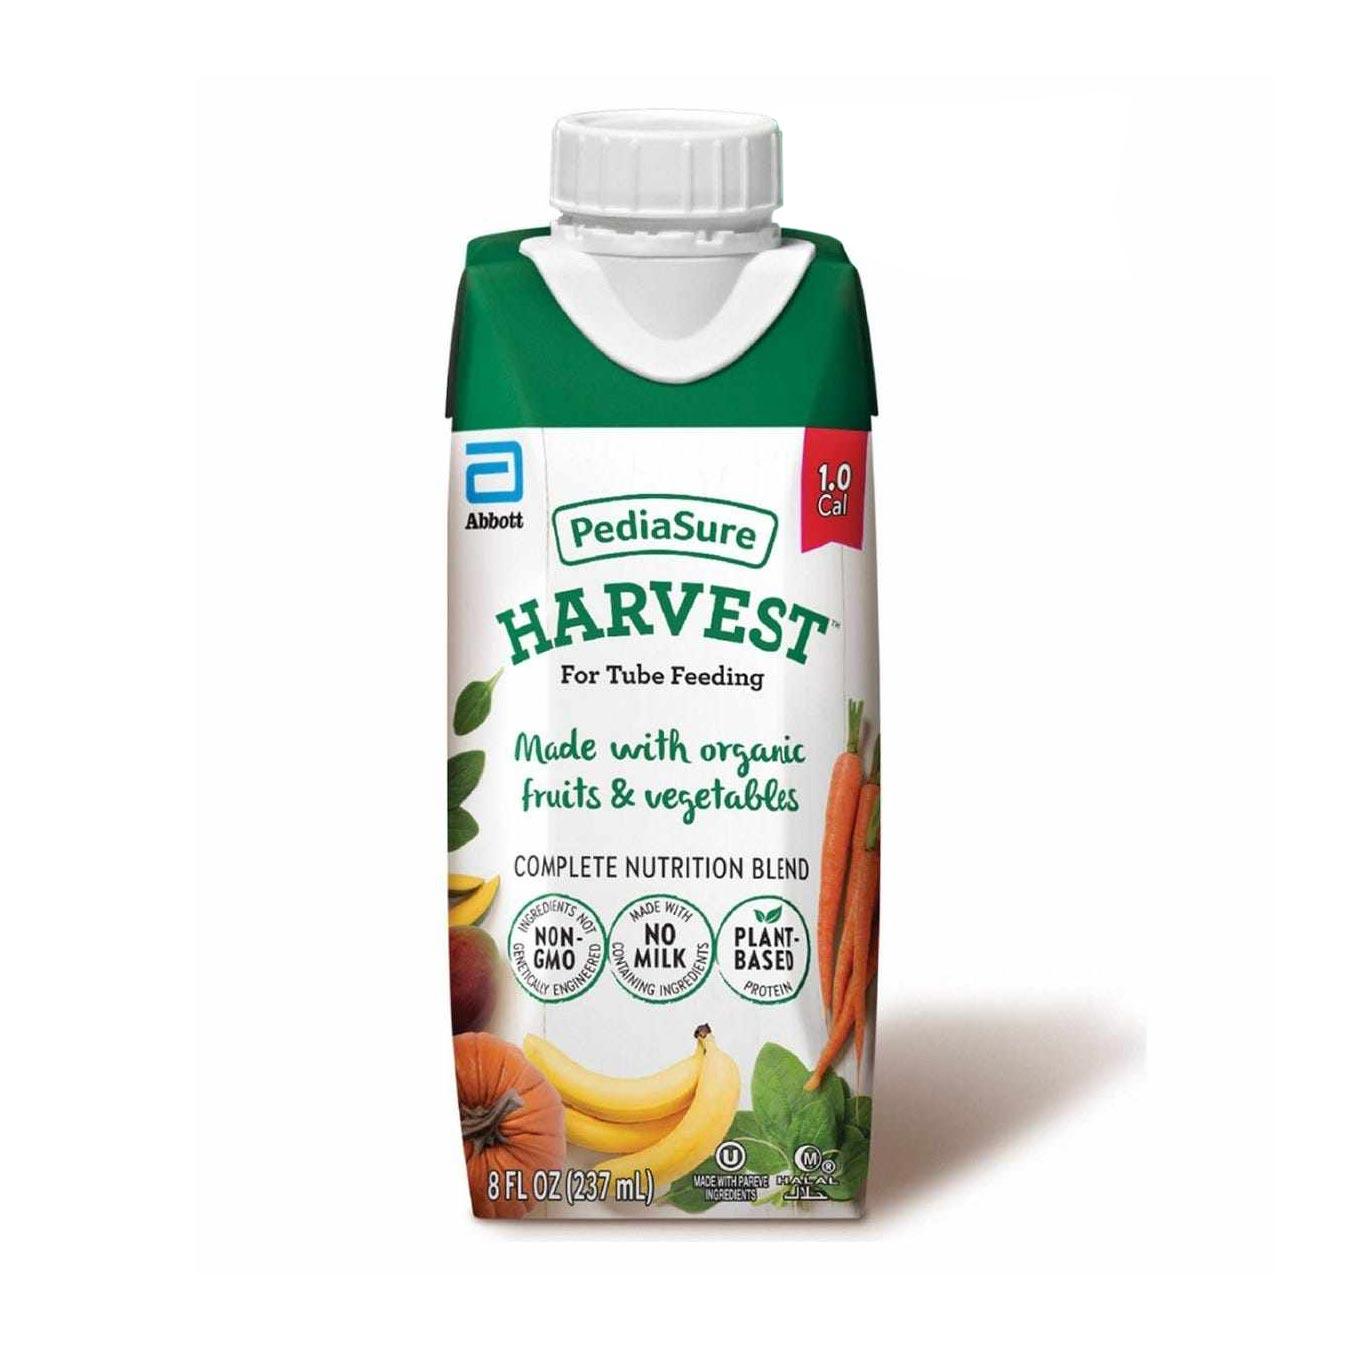 PediaSure Harvest Pediatric Ready to Use Tube Feeding Formula